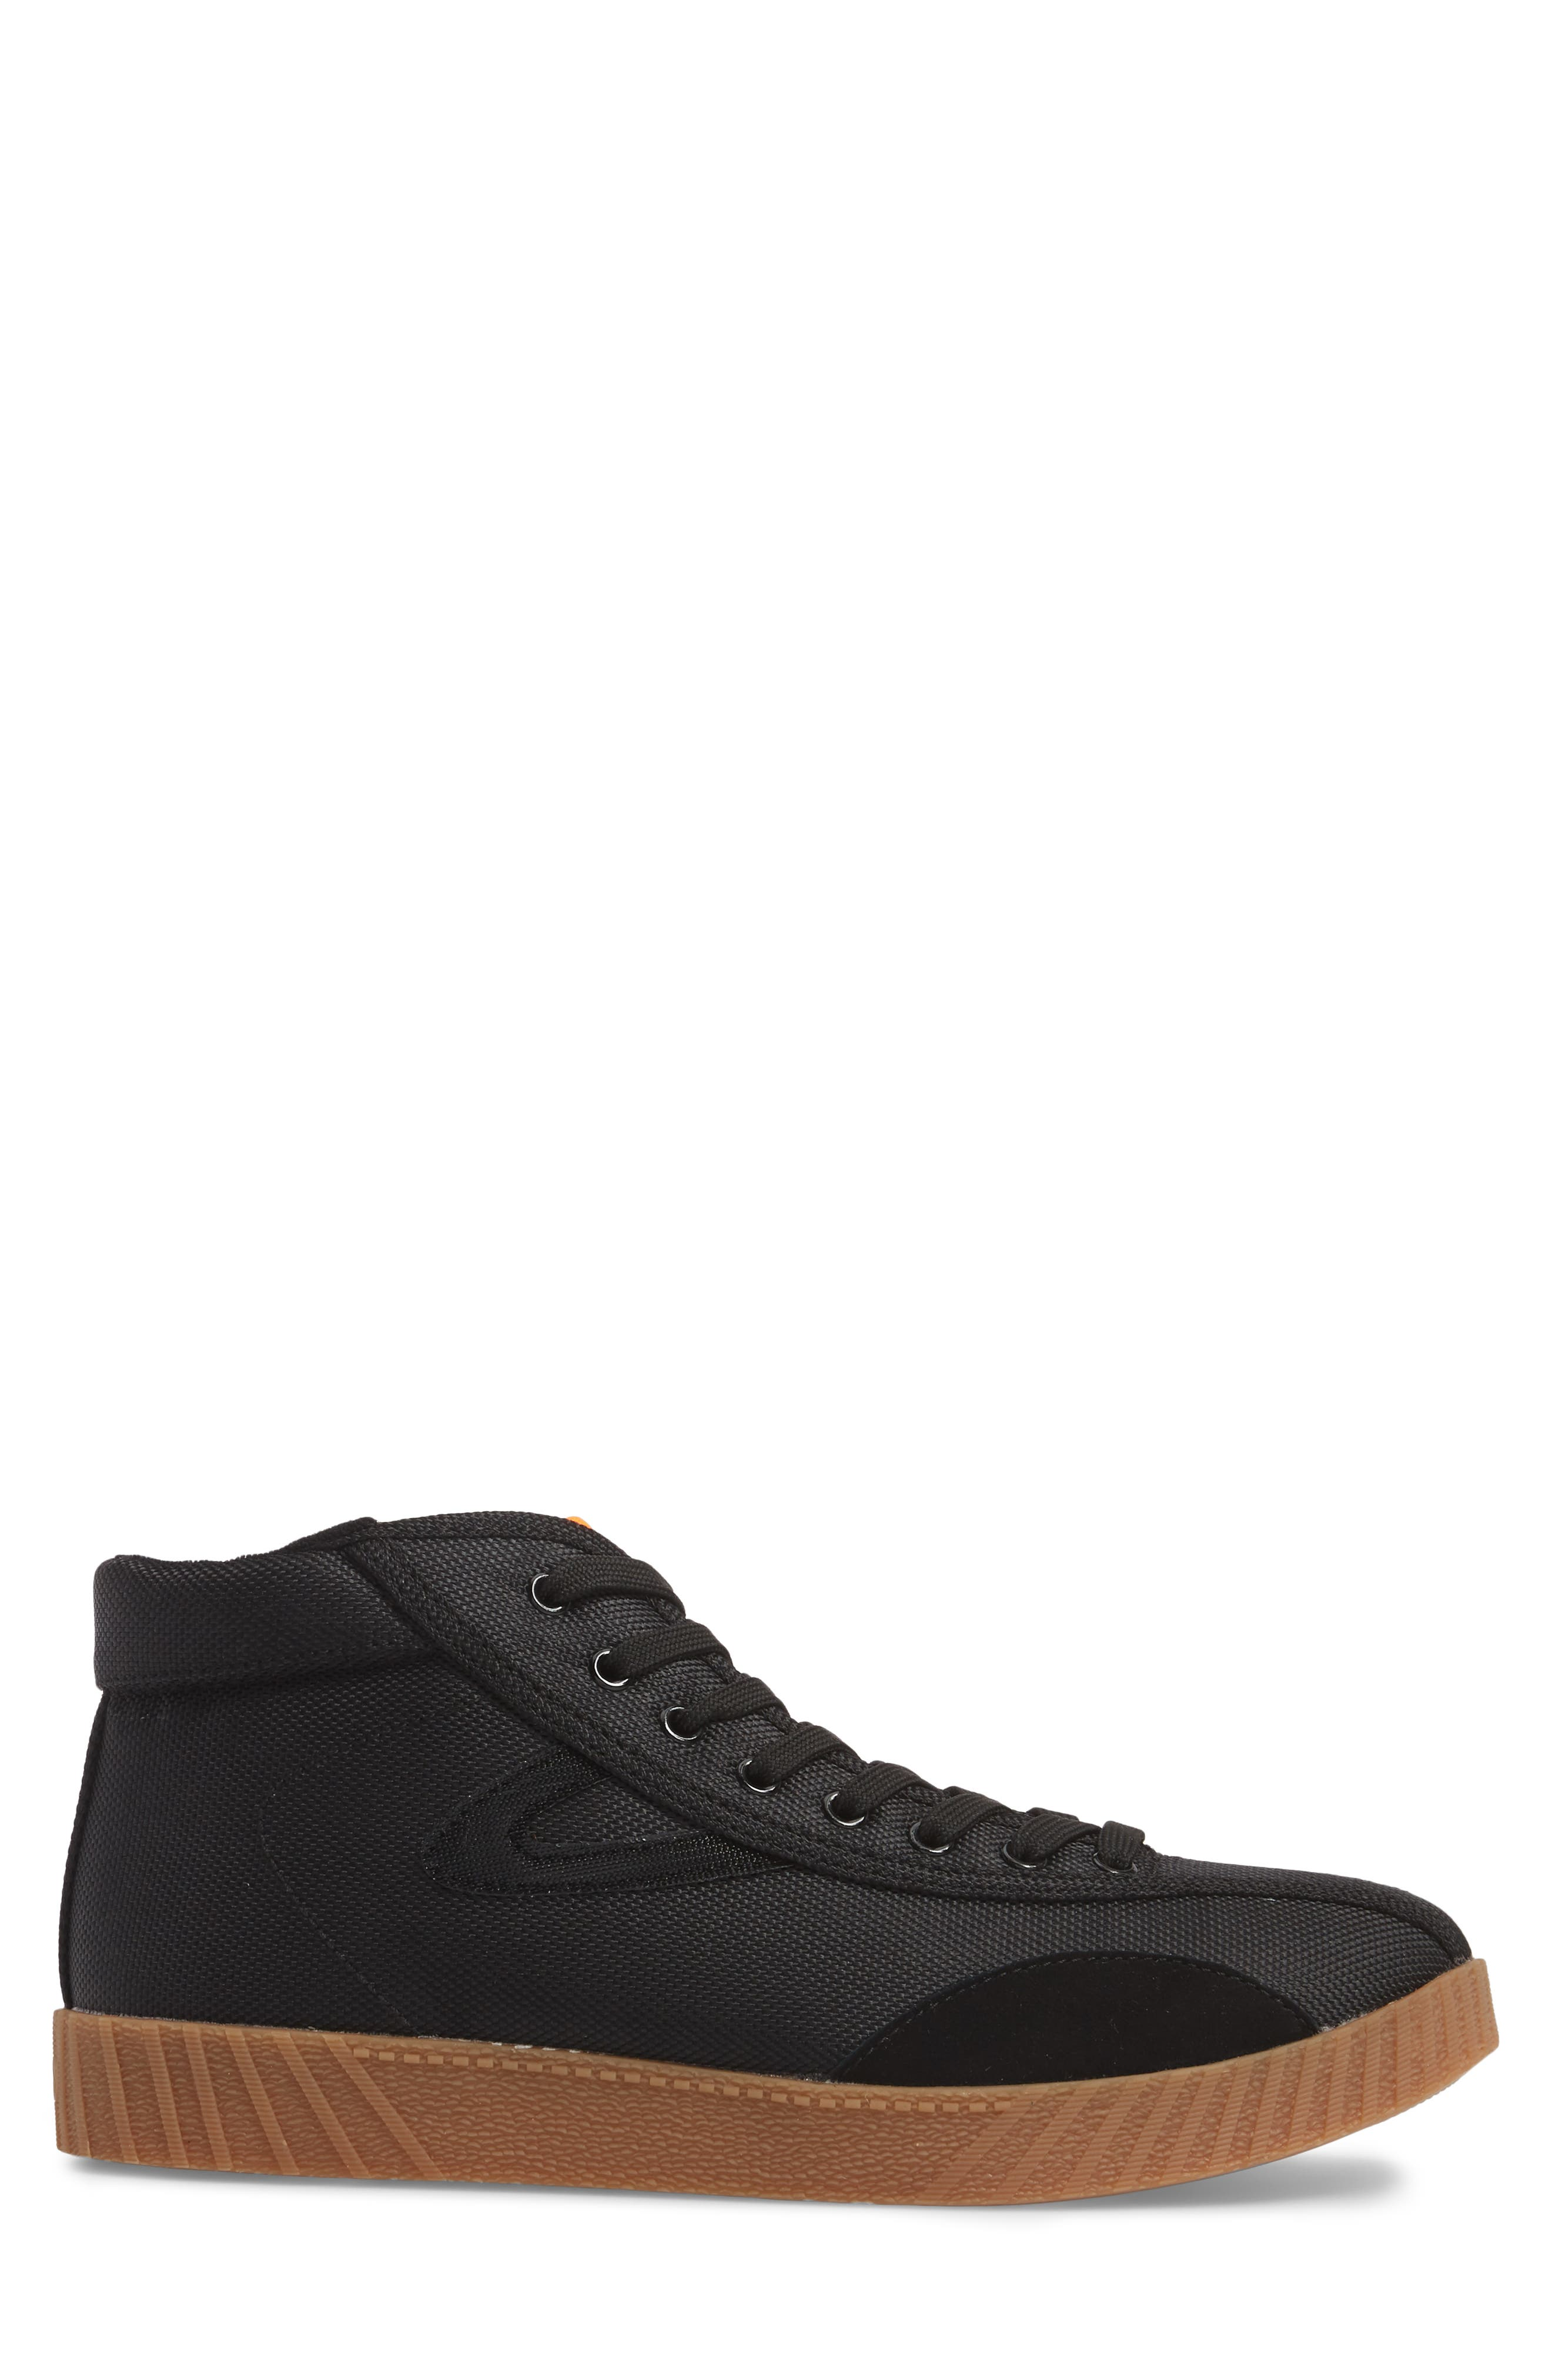 Andre 3000 Nylite High Top Sneaker,                             Alternate thumbnail 3, color,                             Black/ Neon Orange Nylon